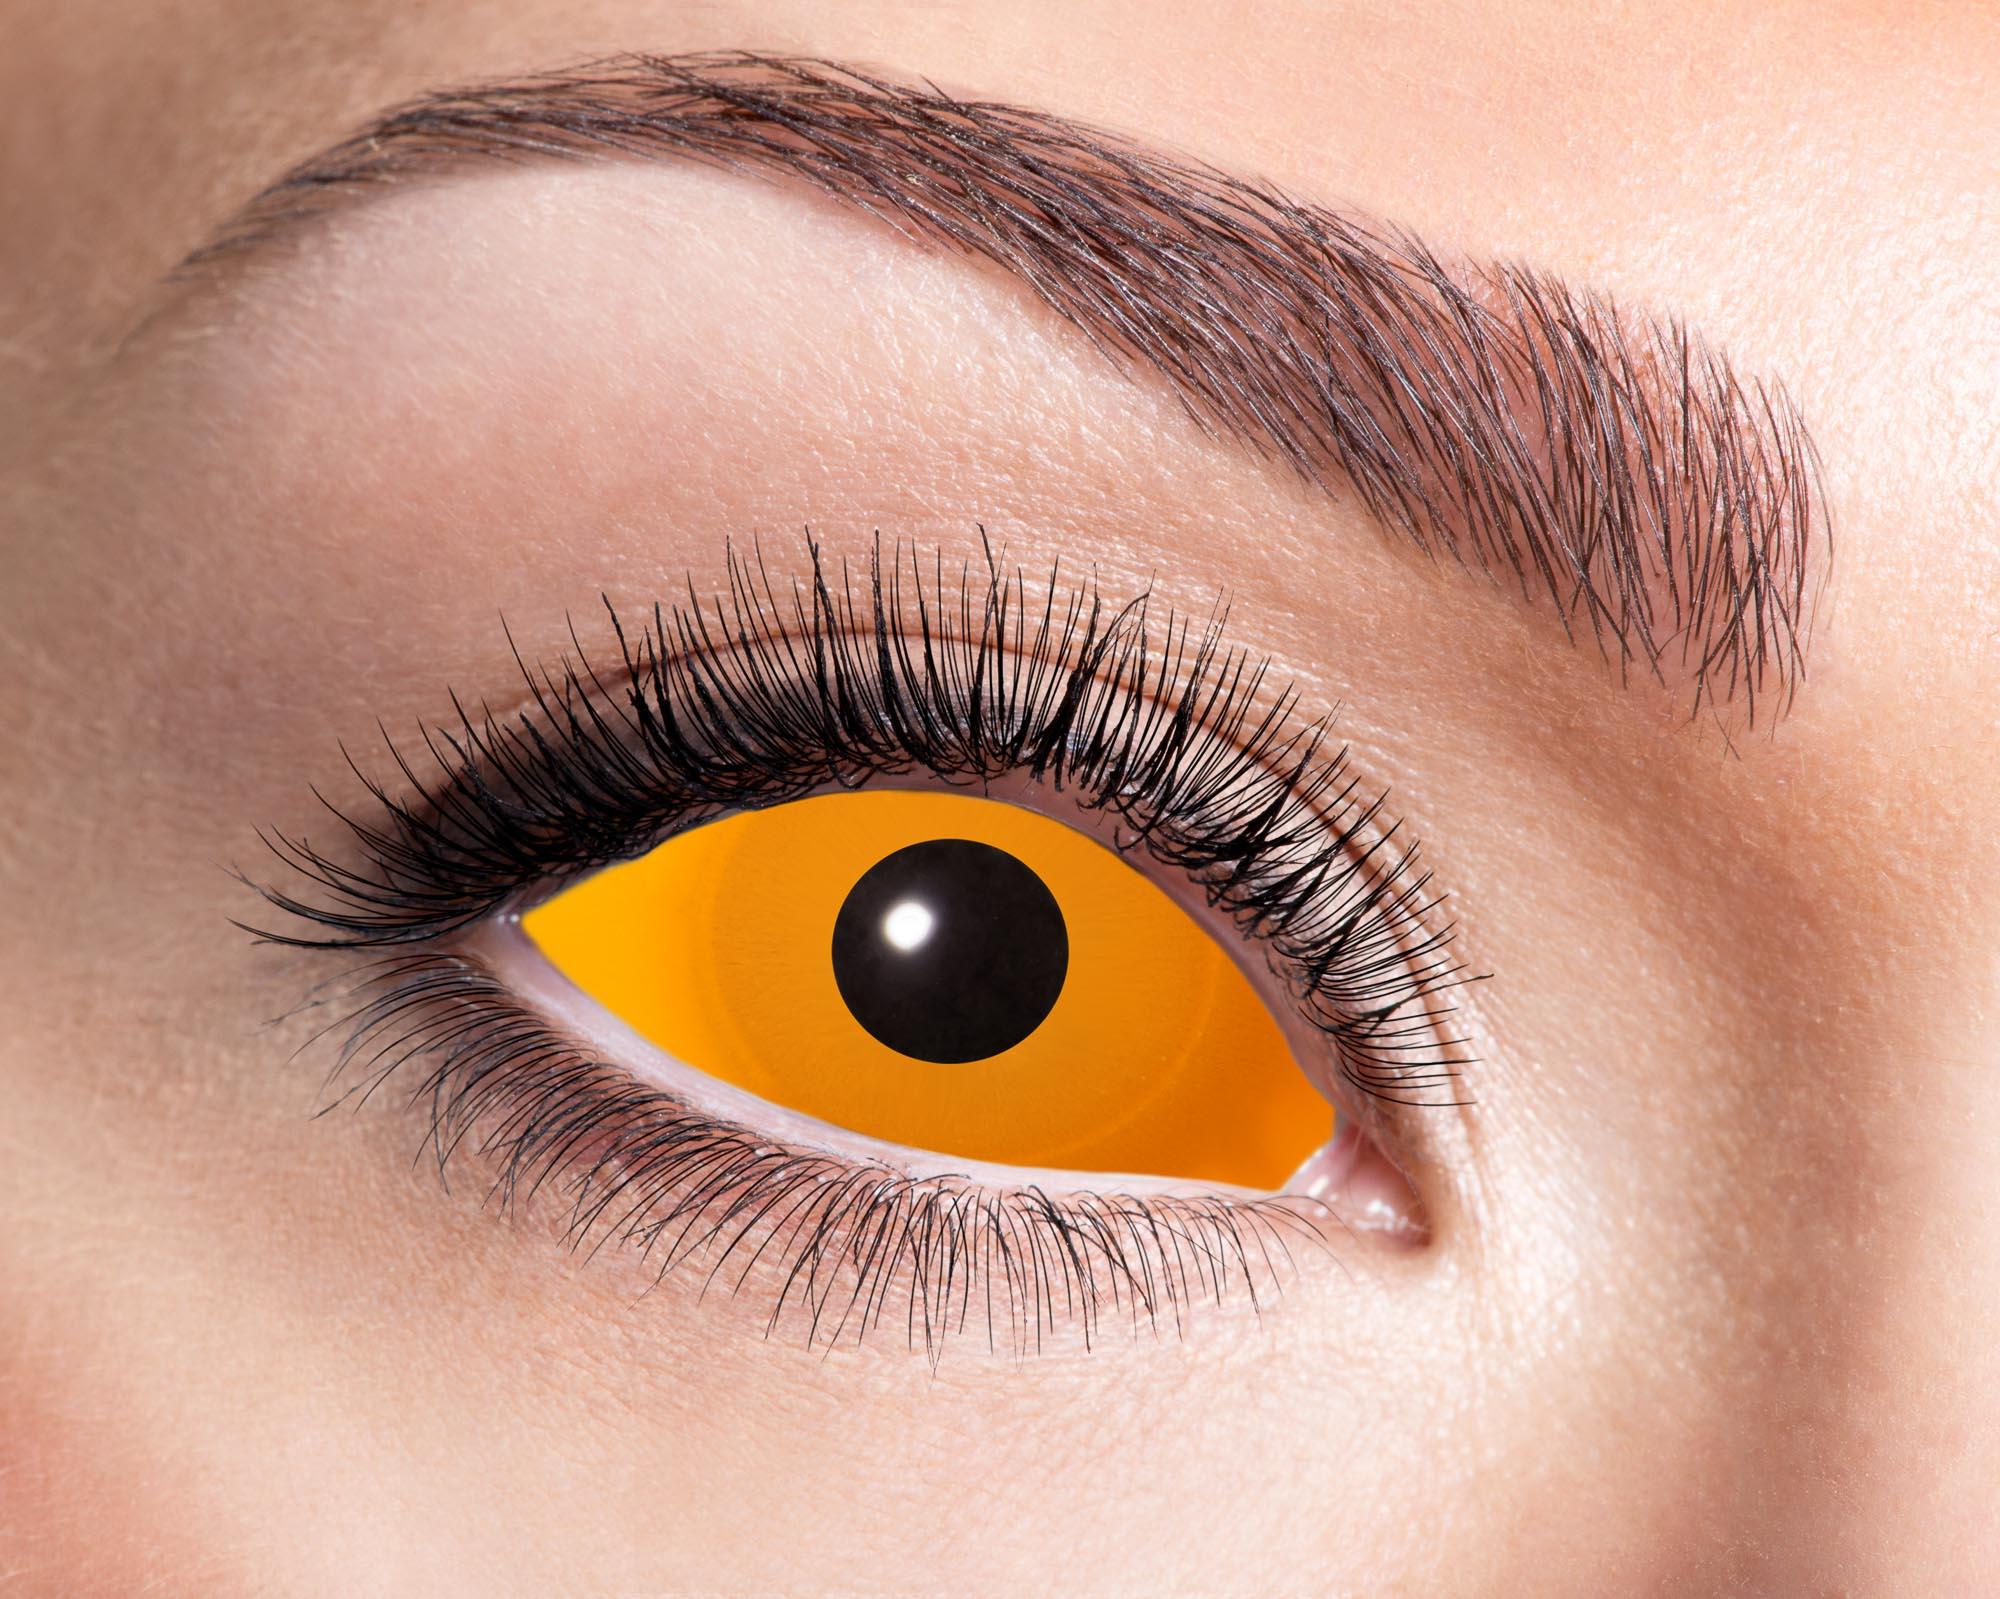 Scleralinser Orange Eyes